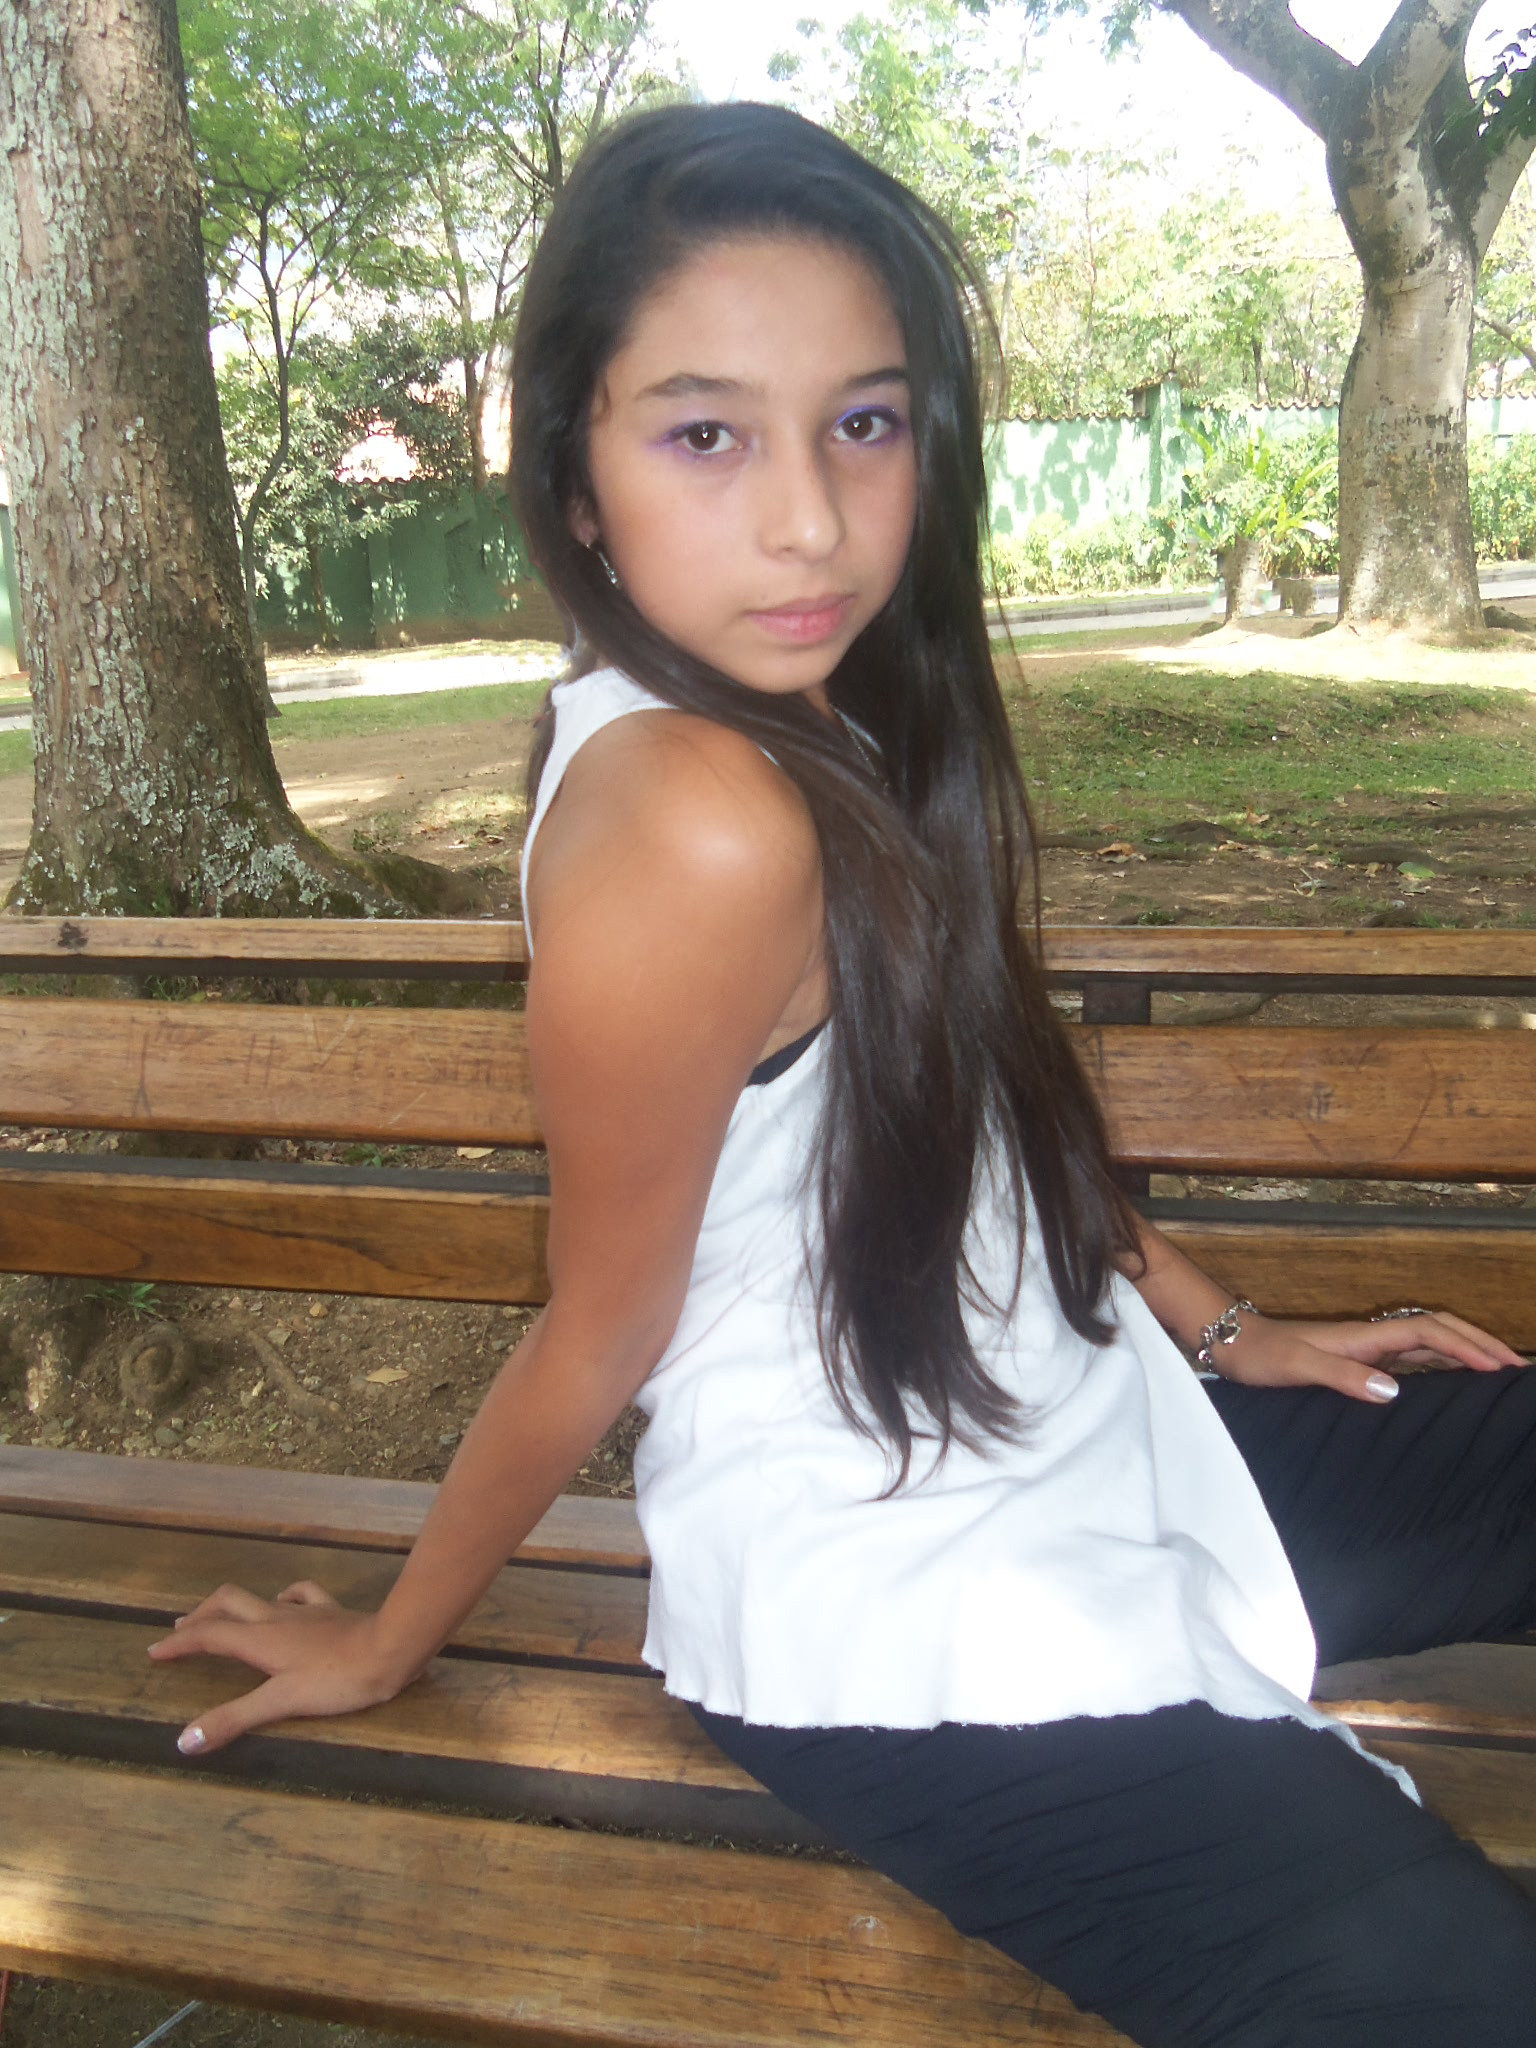 Maria alejandra ttl